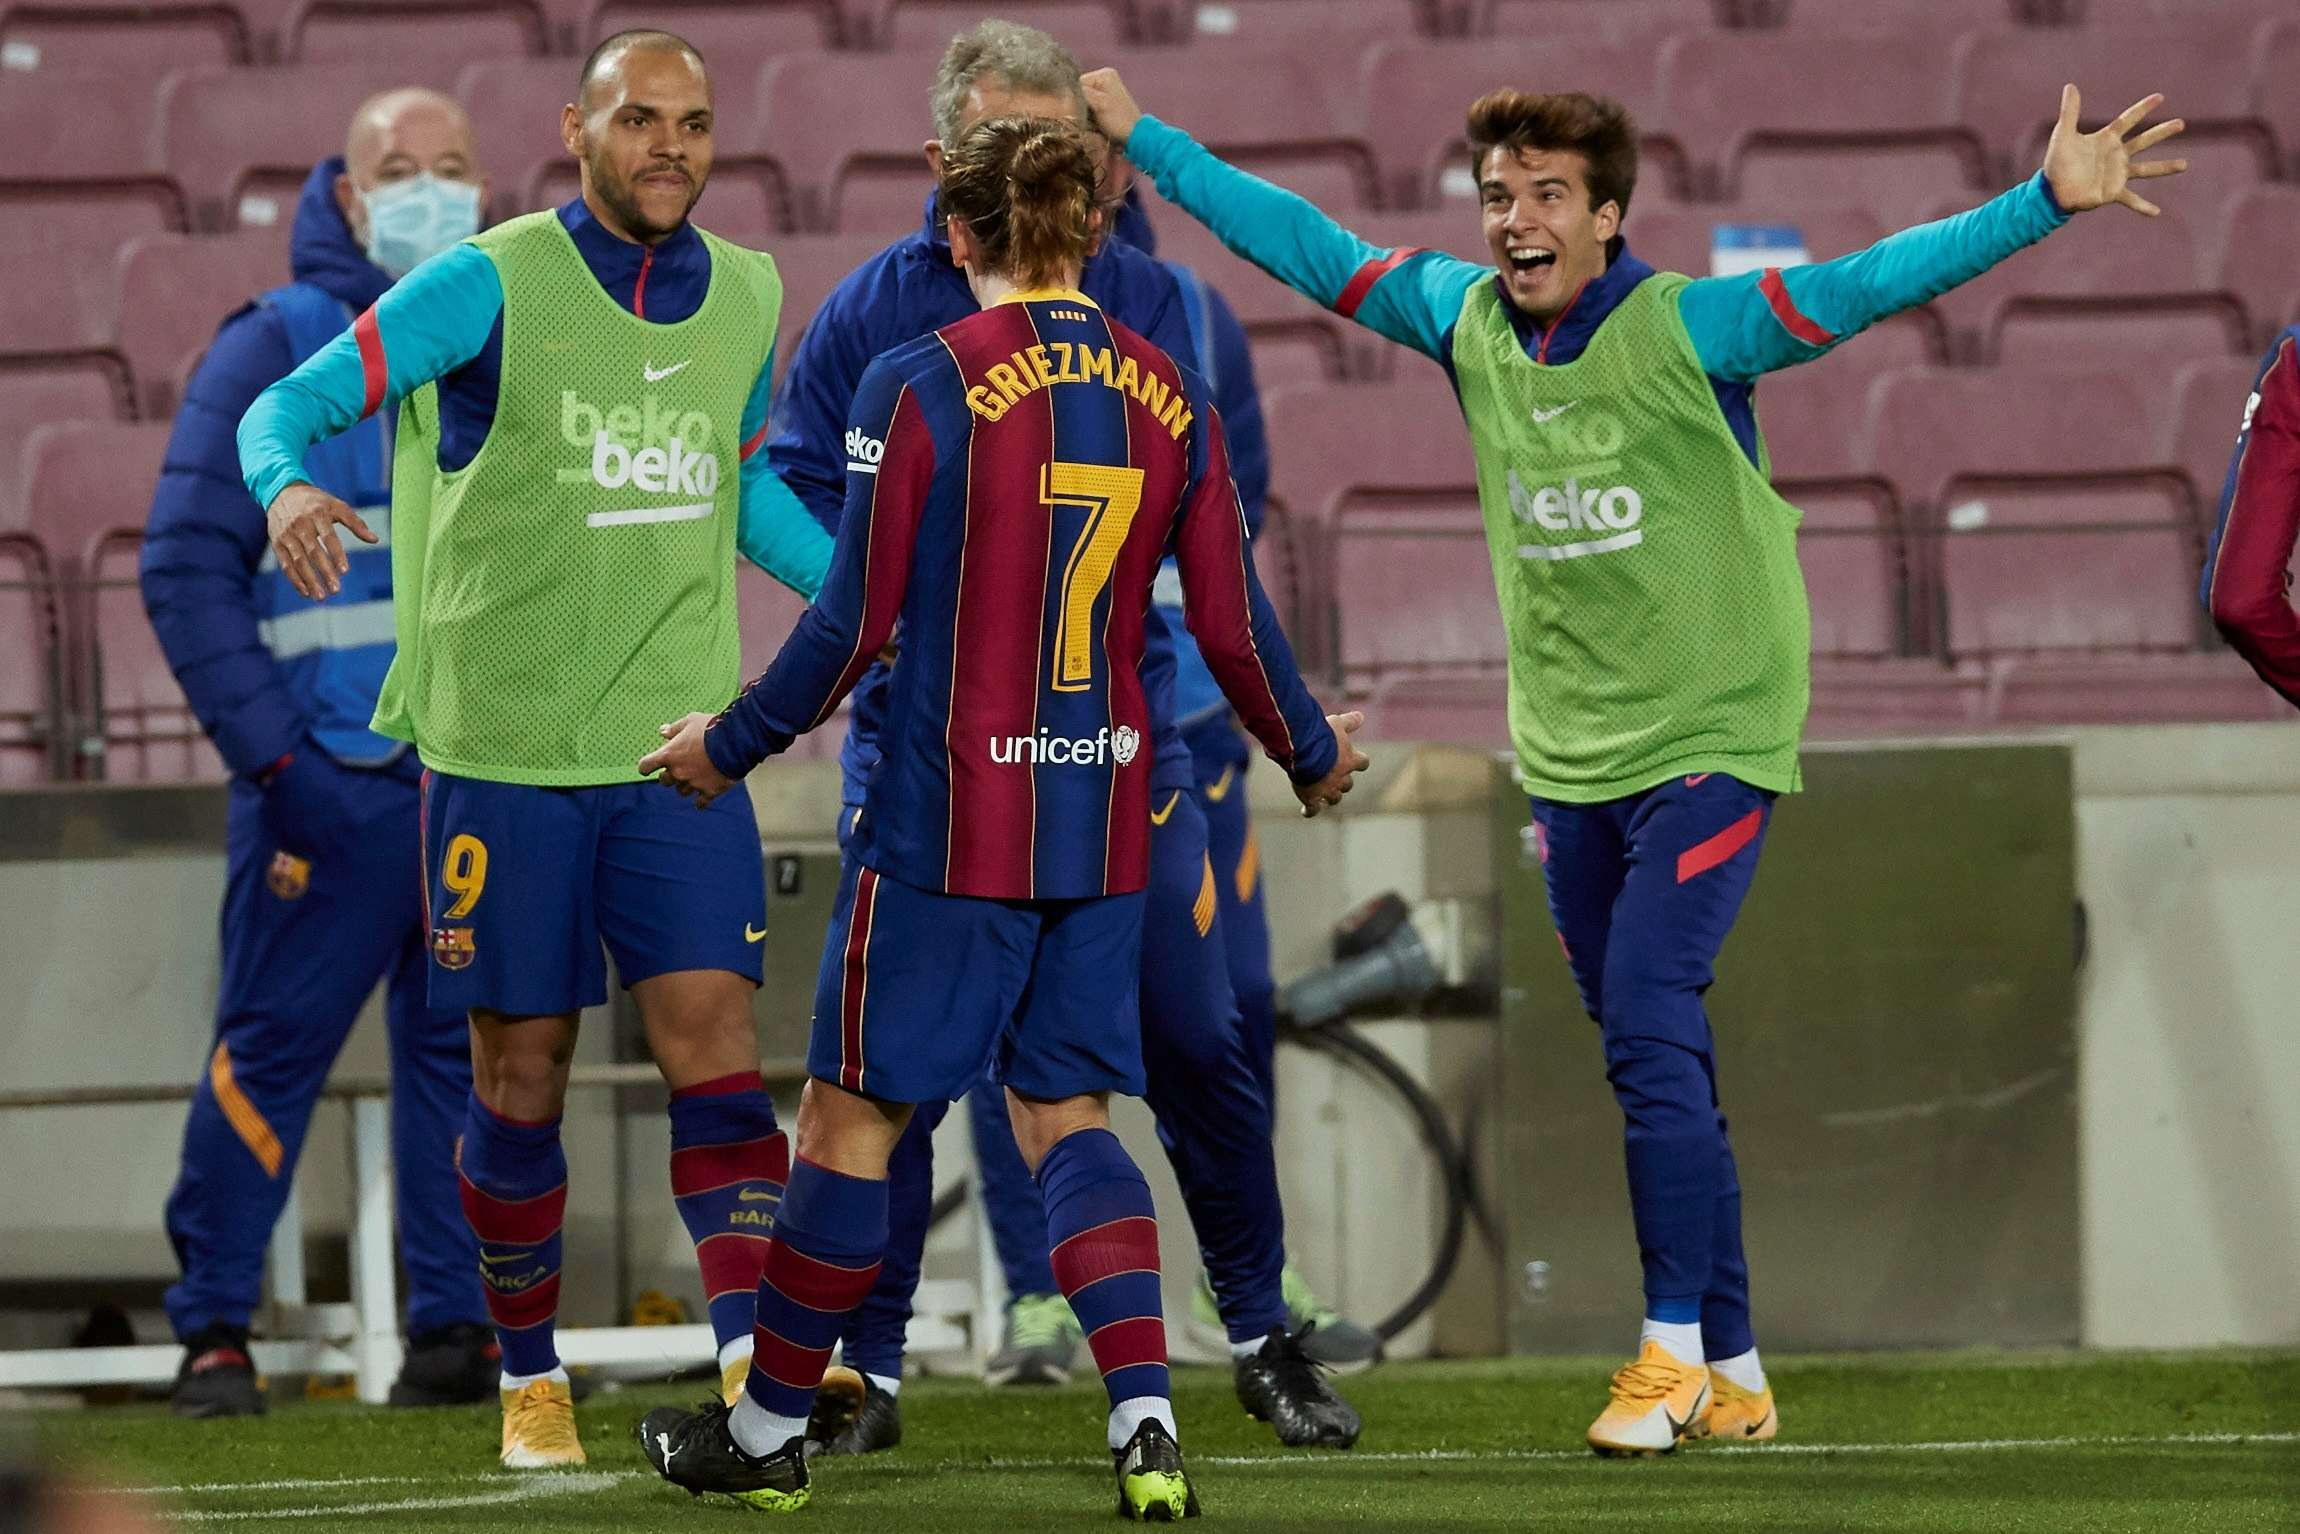 Griezmann (c) celebra tras marcar el segundo gol. /EFE